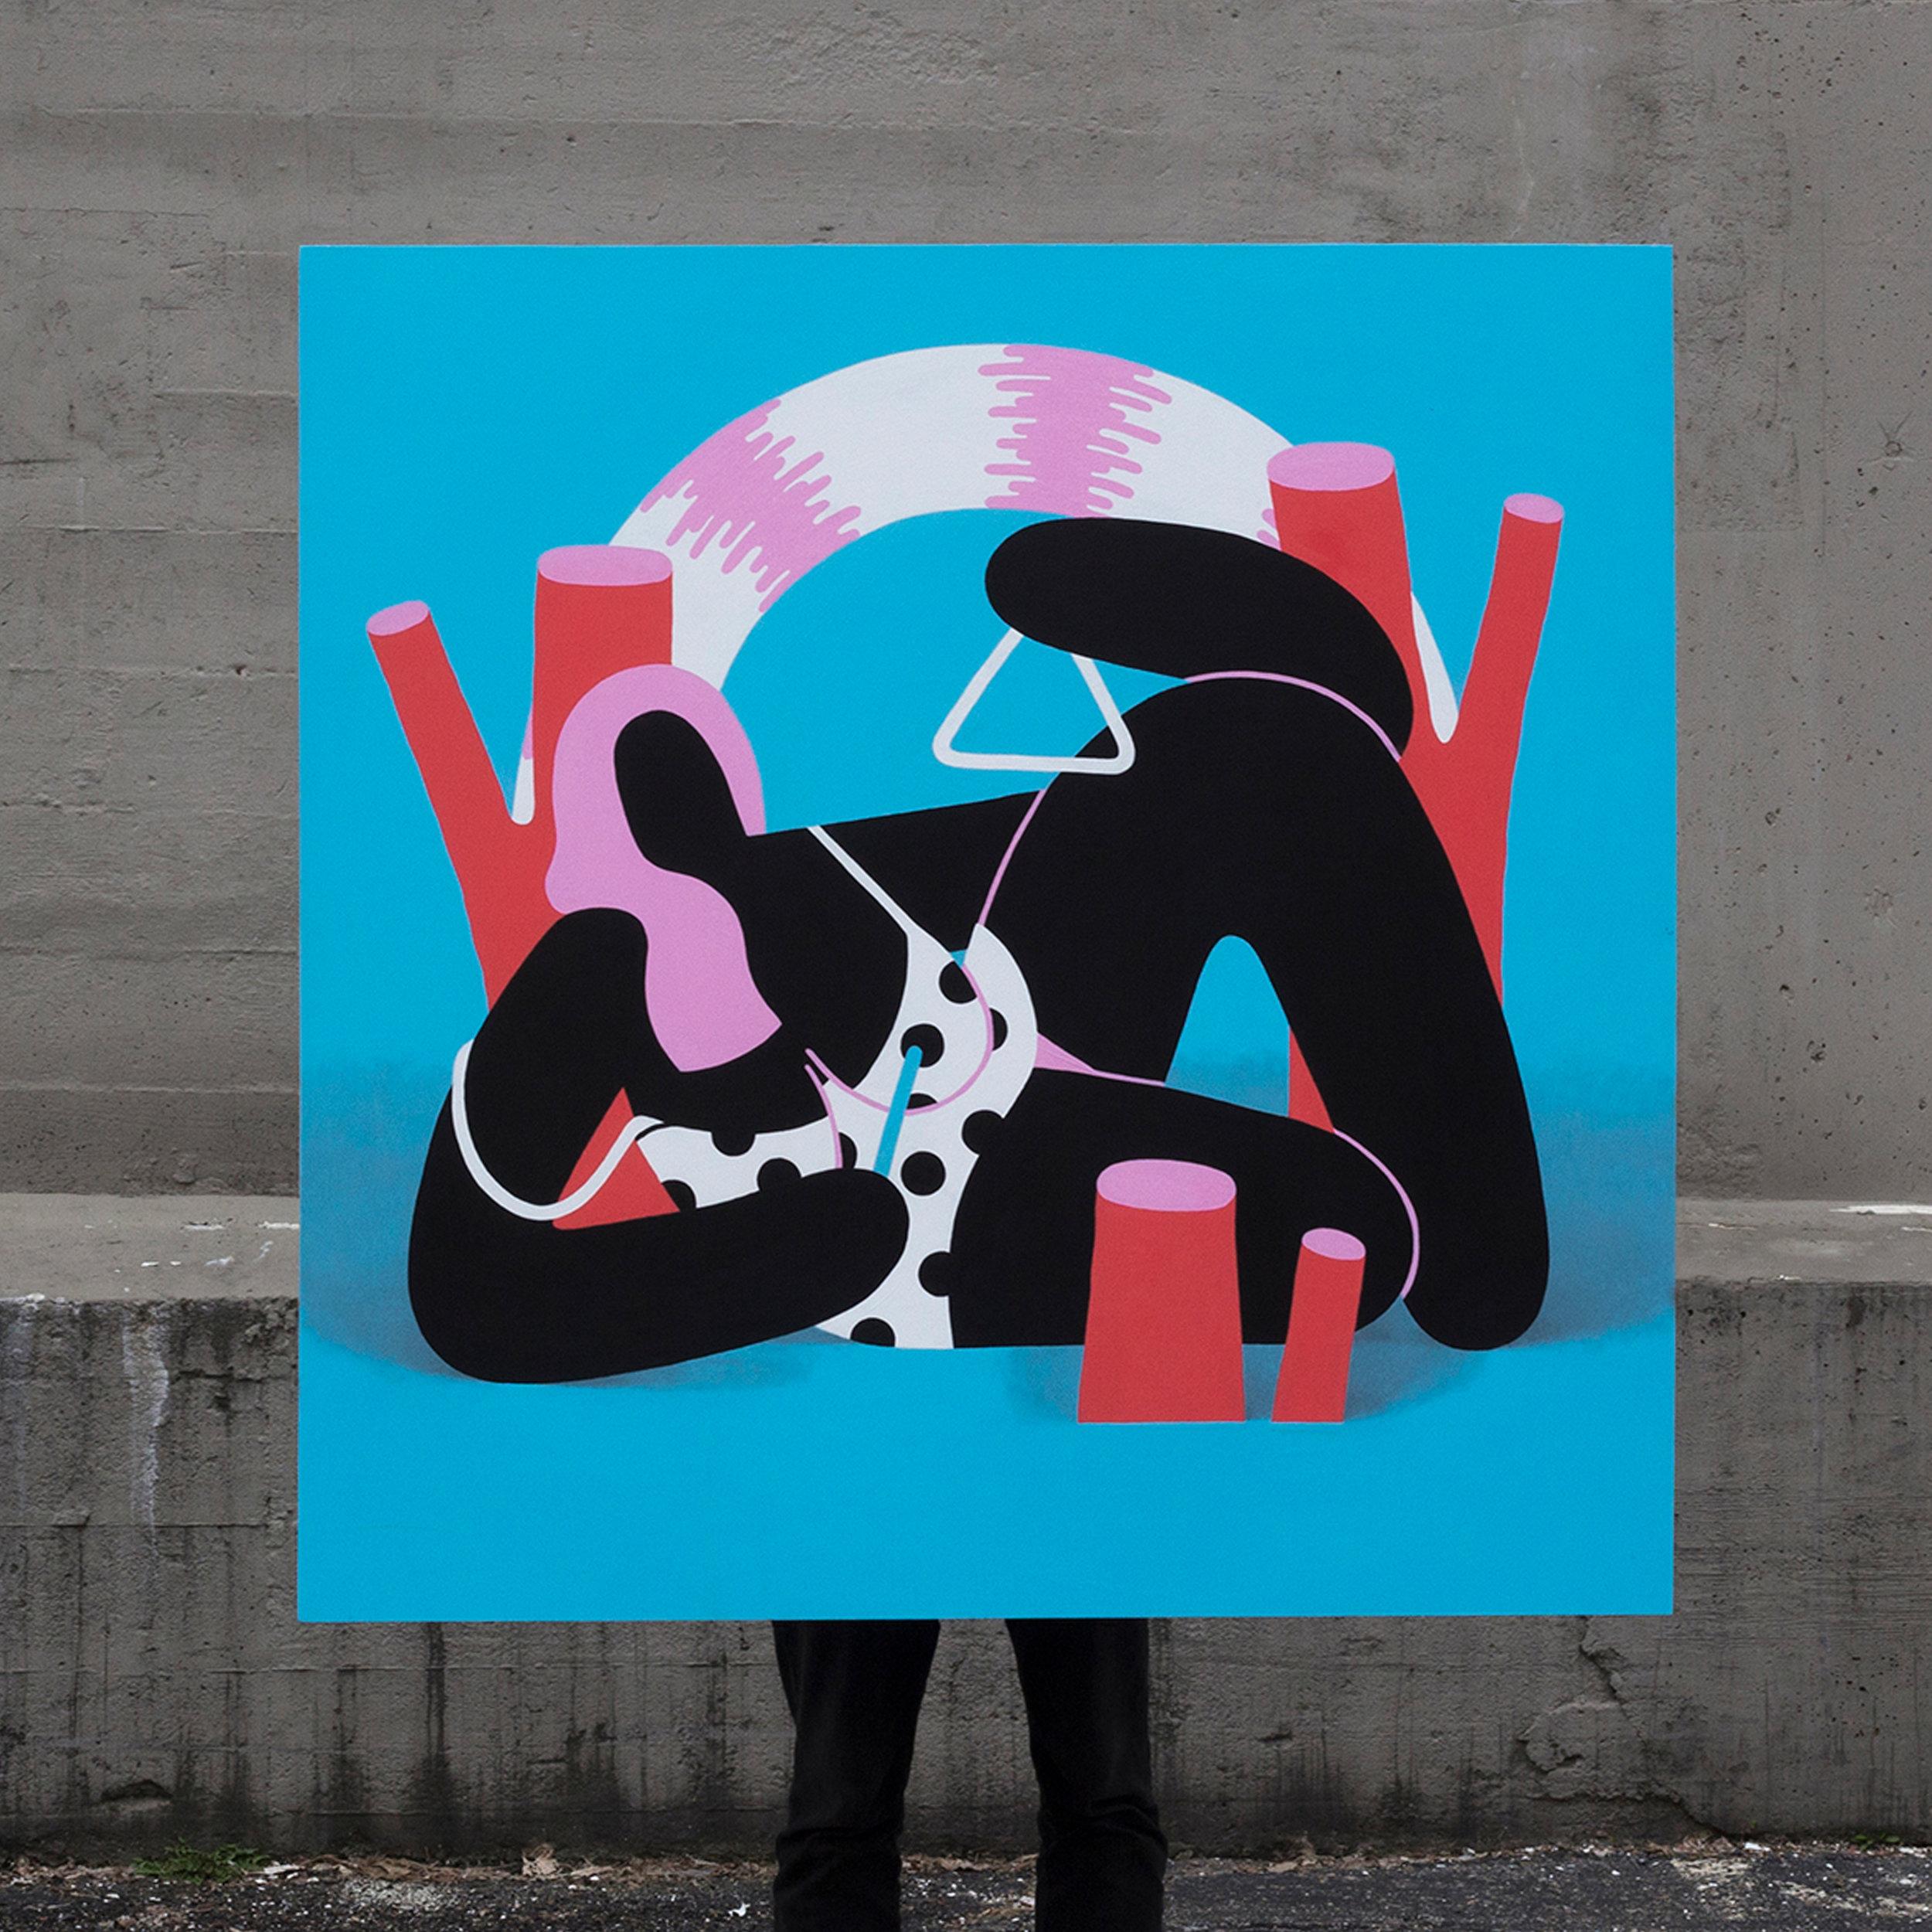 Moods - Acrylic on panel by Jackson Tupper